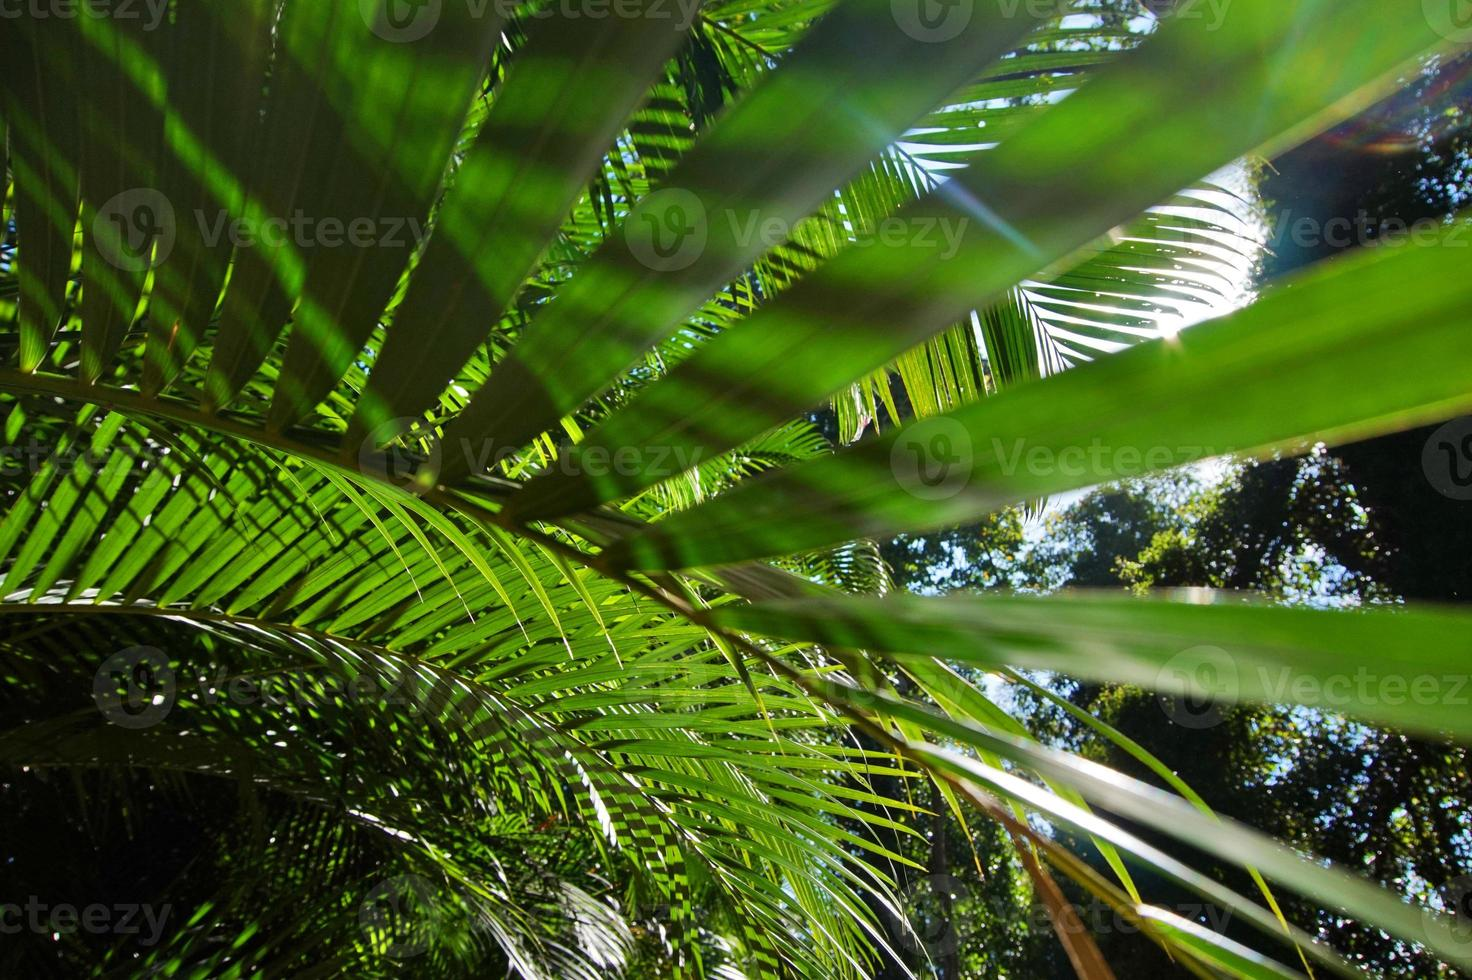 Sri Lanka, Kandy, de bladeren van palmbomen foto